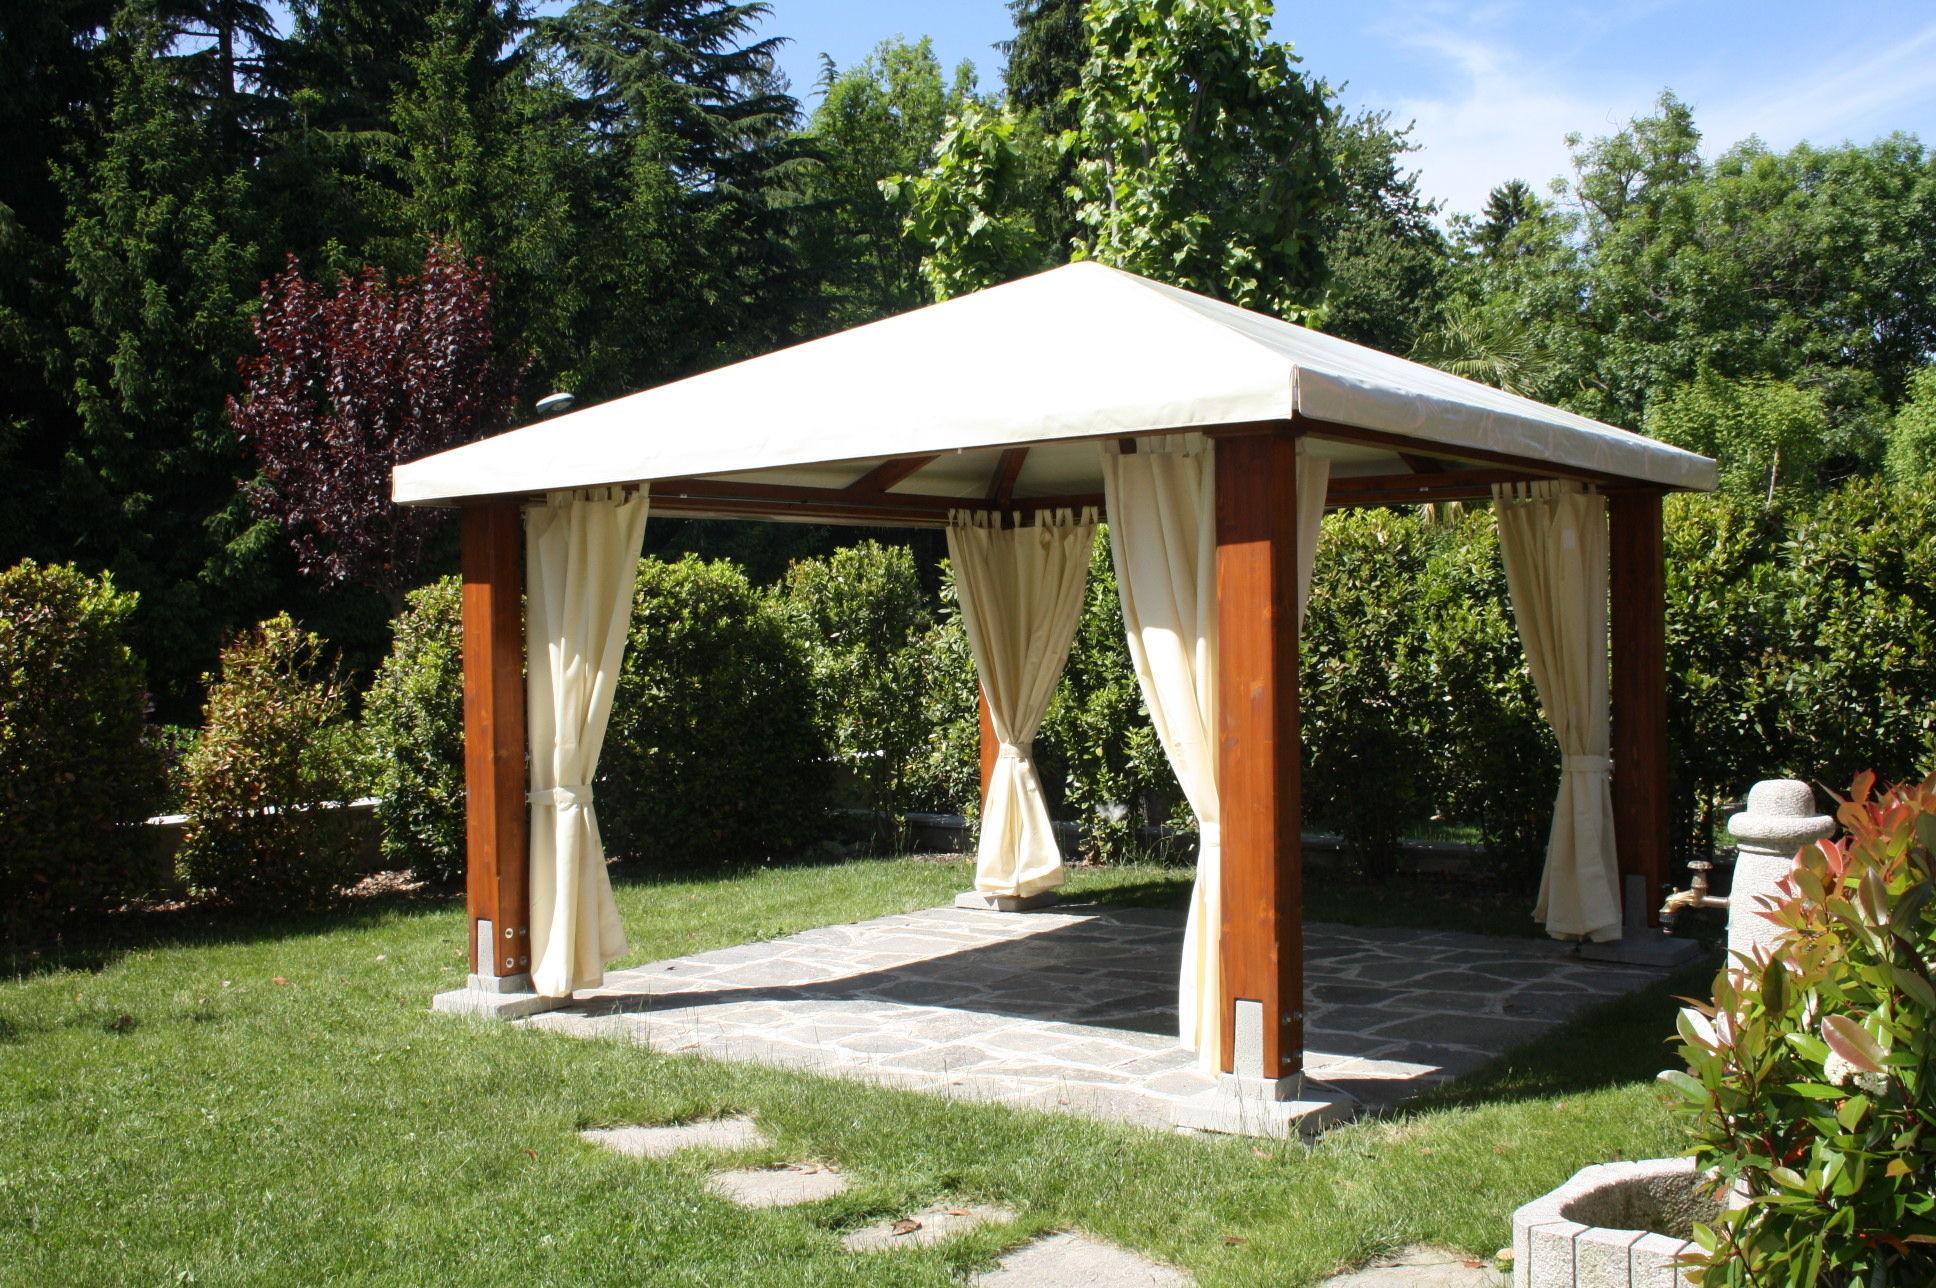 Wooden Gazebo Fabric Roof Classic Proverbio Outdoor Design